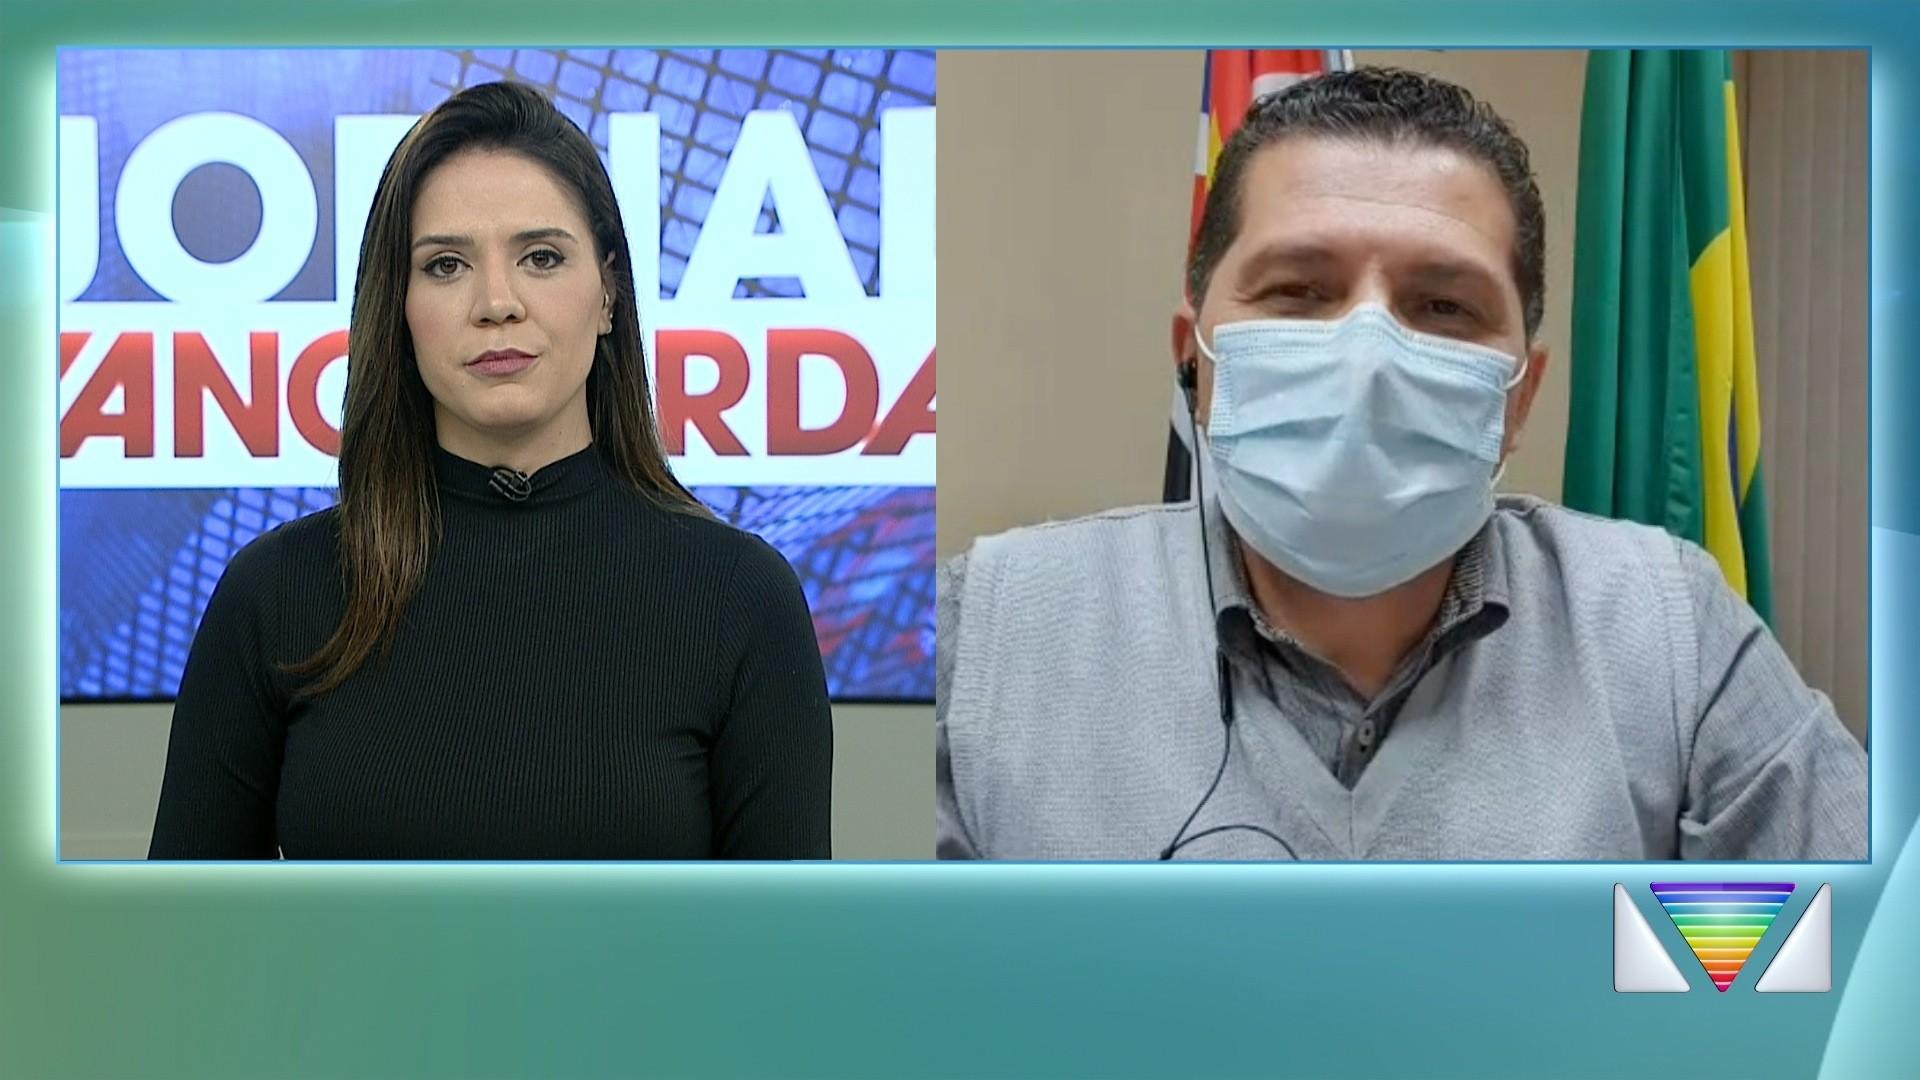 VÍDEOS: Jornal Vanguarda de terça-feira, 14 de julho